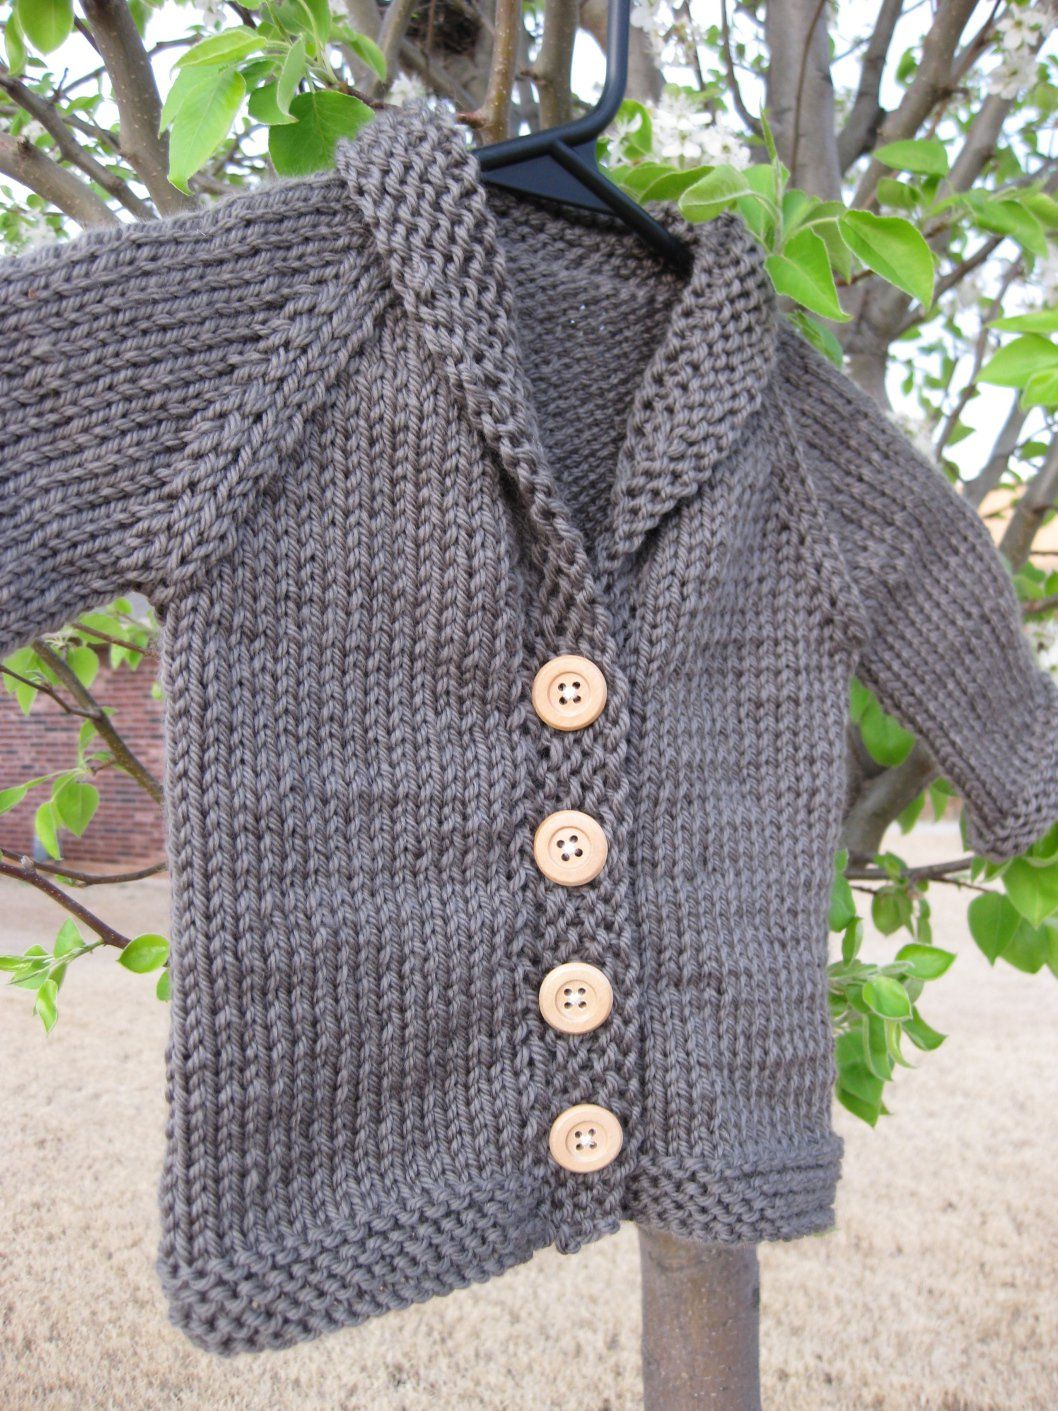 10 free baby sweater knitting patterns knitting patterns 10 free baby sweater knitting patterns bankloansurffo Gallery